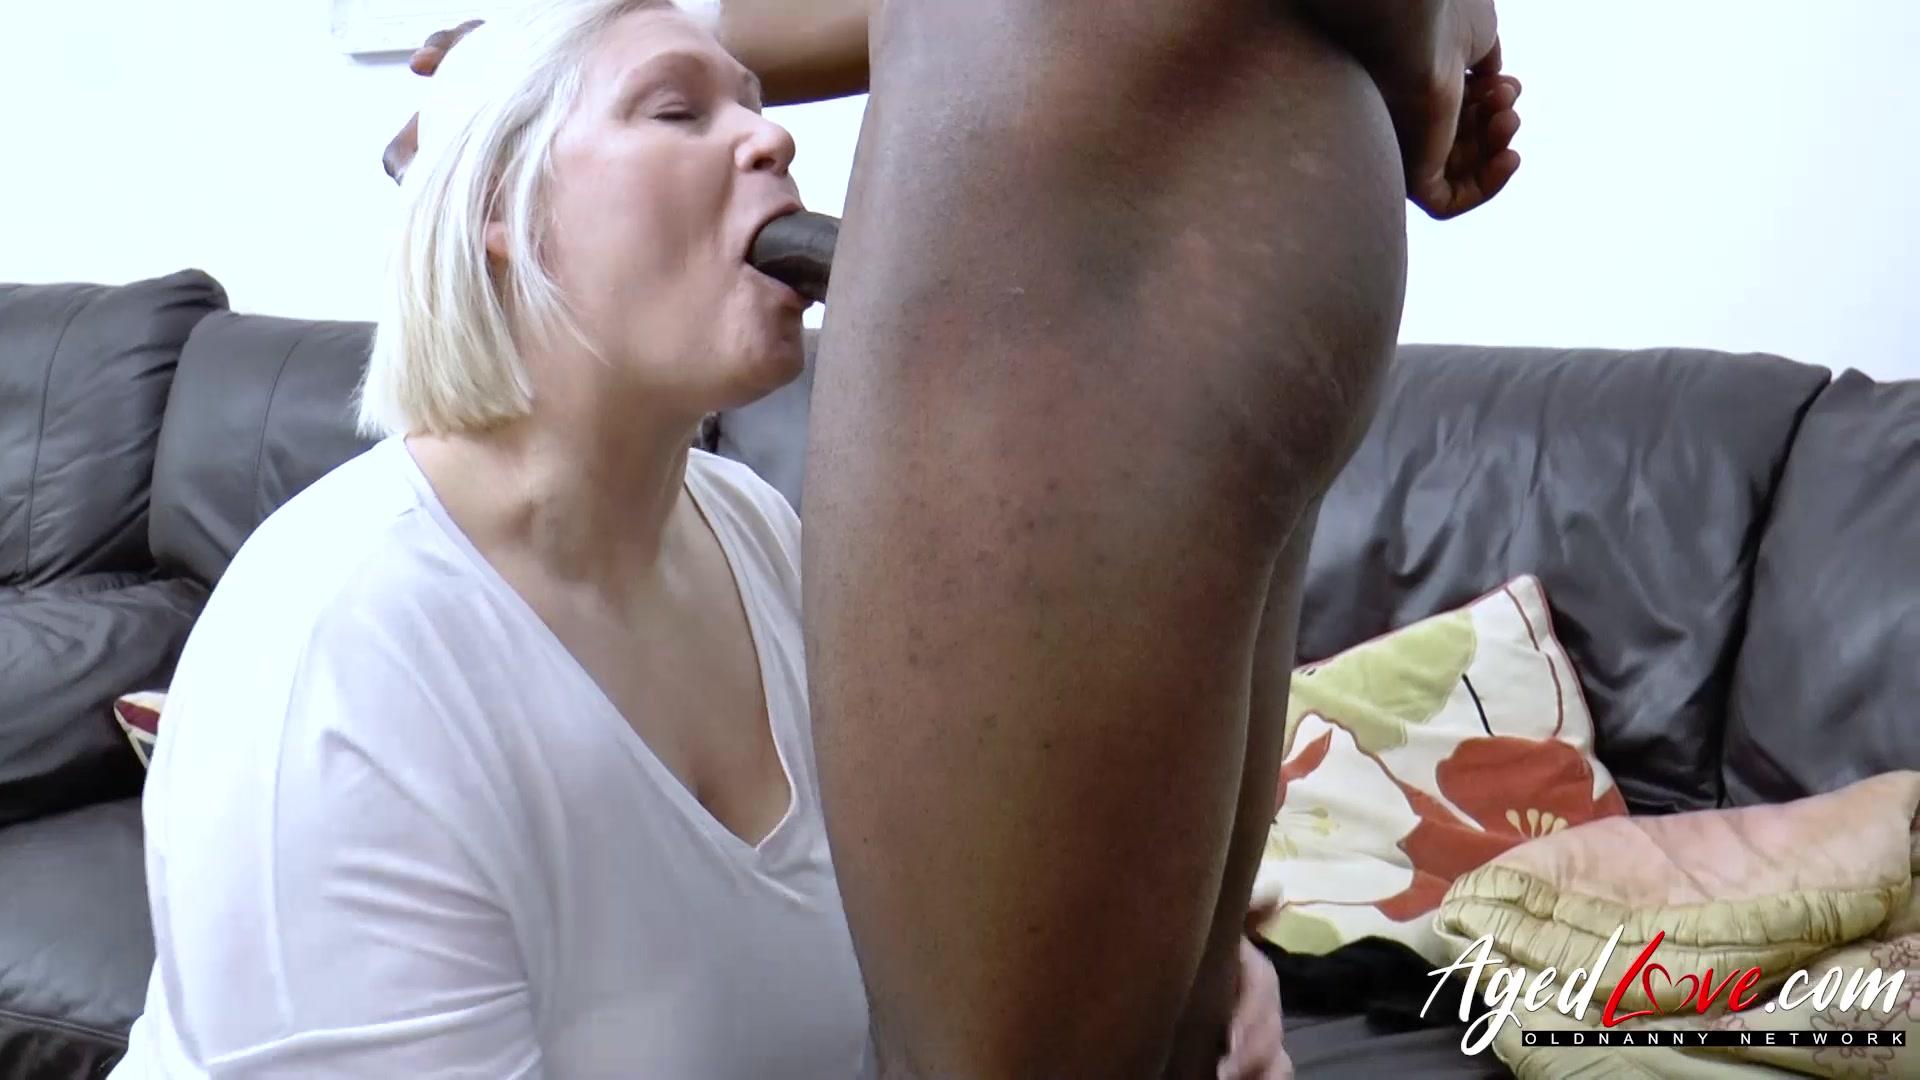 Agedlove lacey starr xxl size granny hardcore sex 2